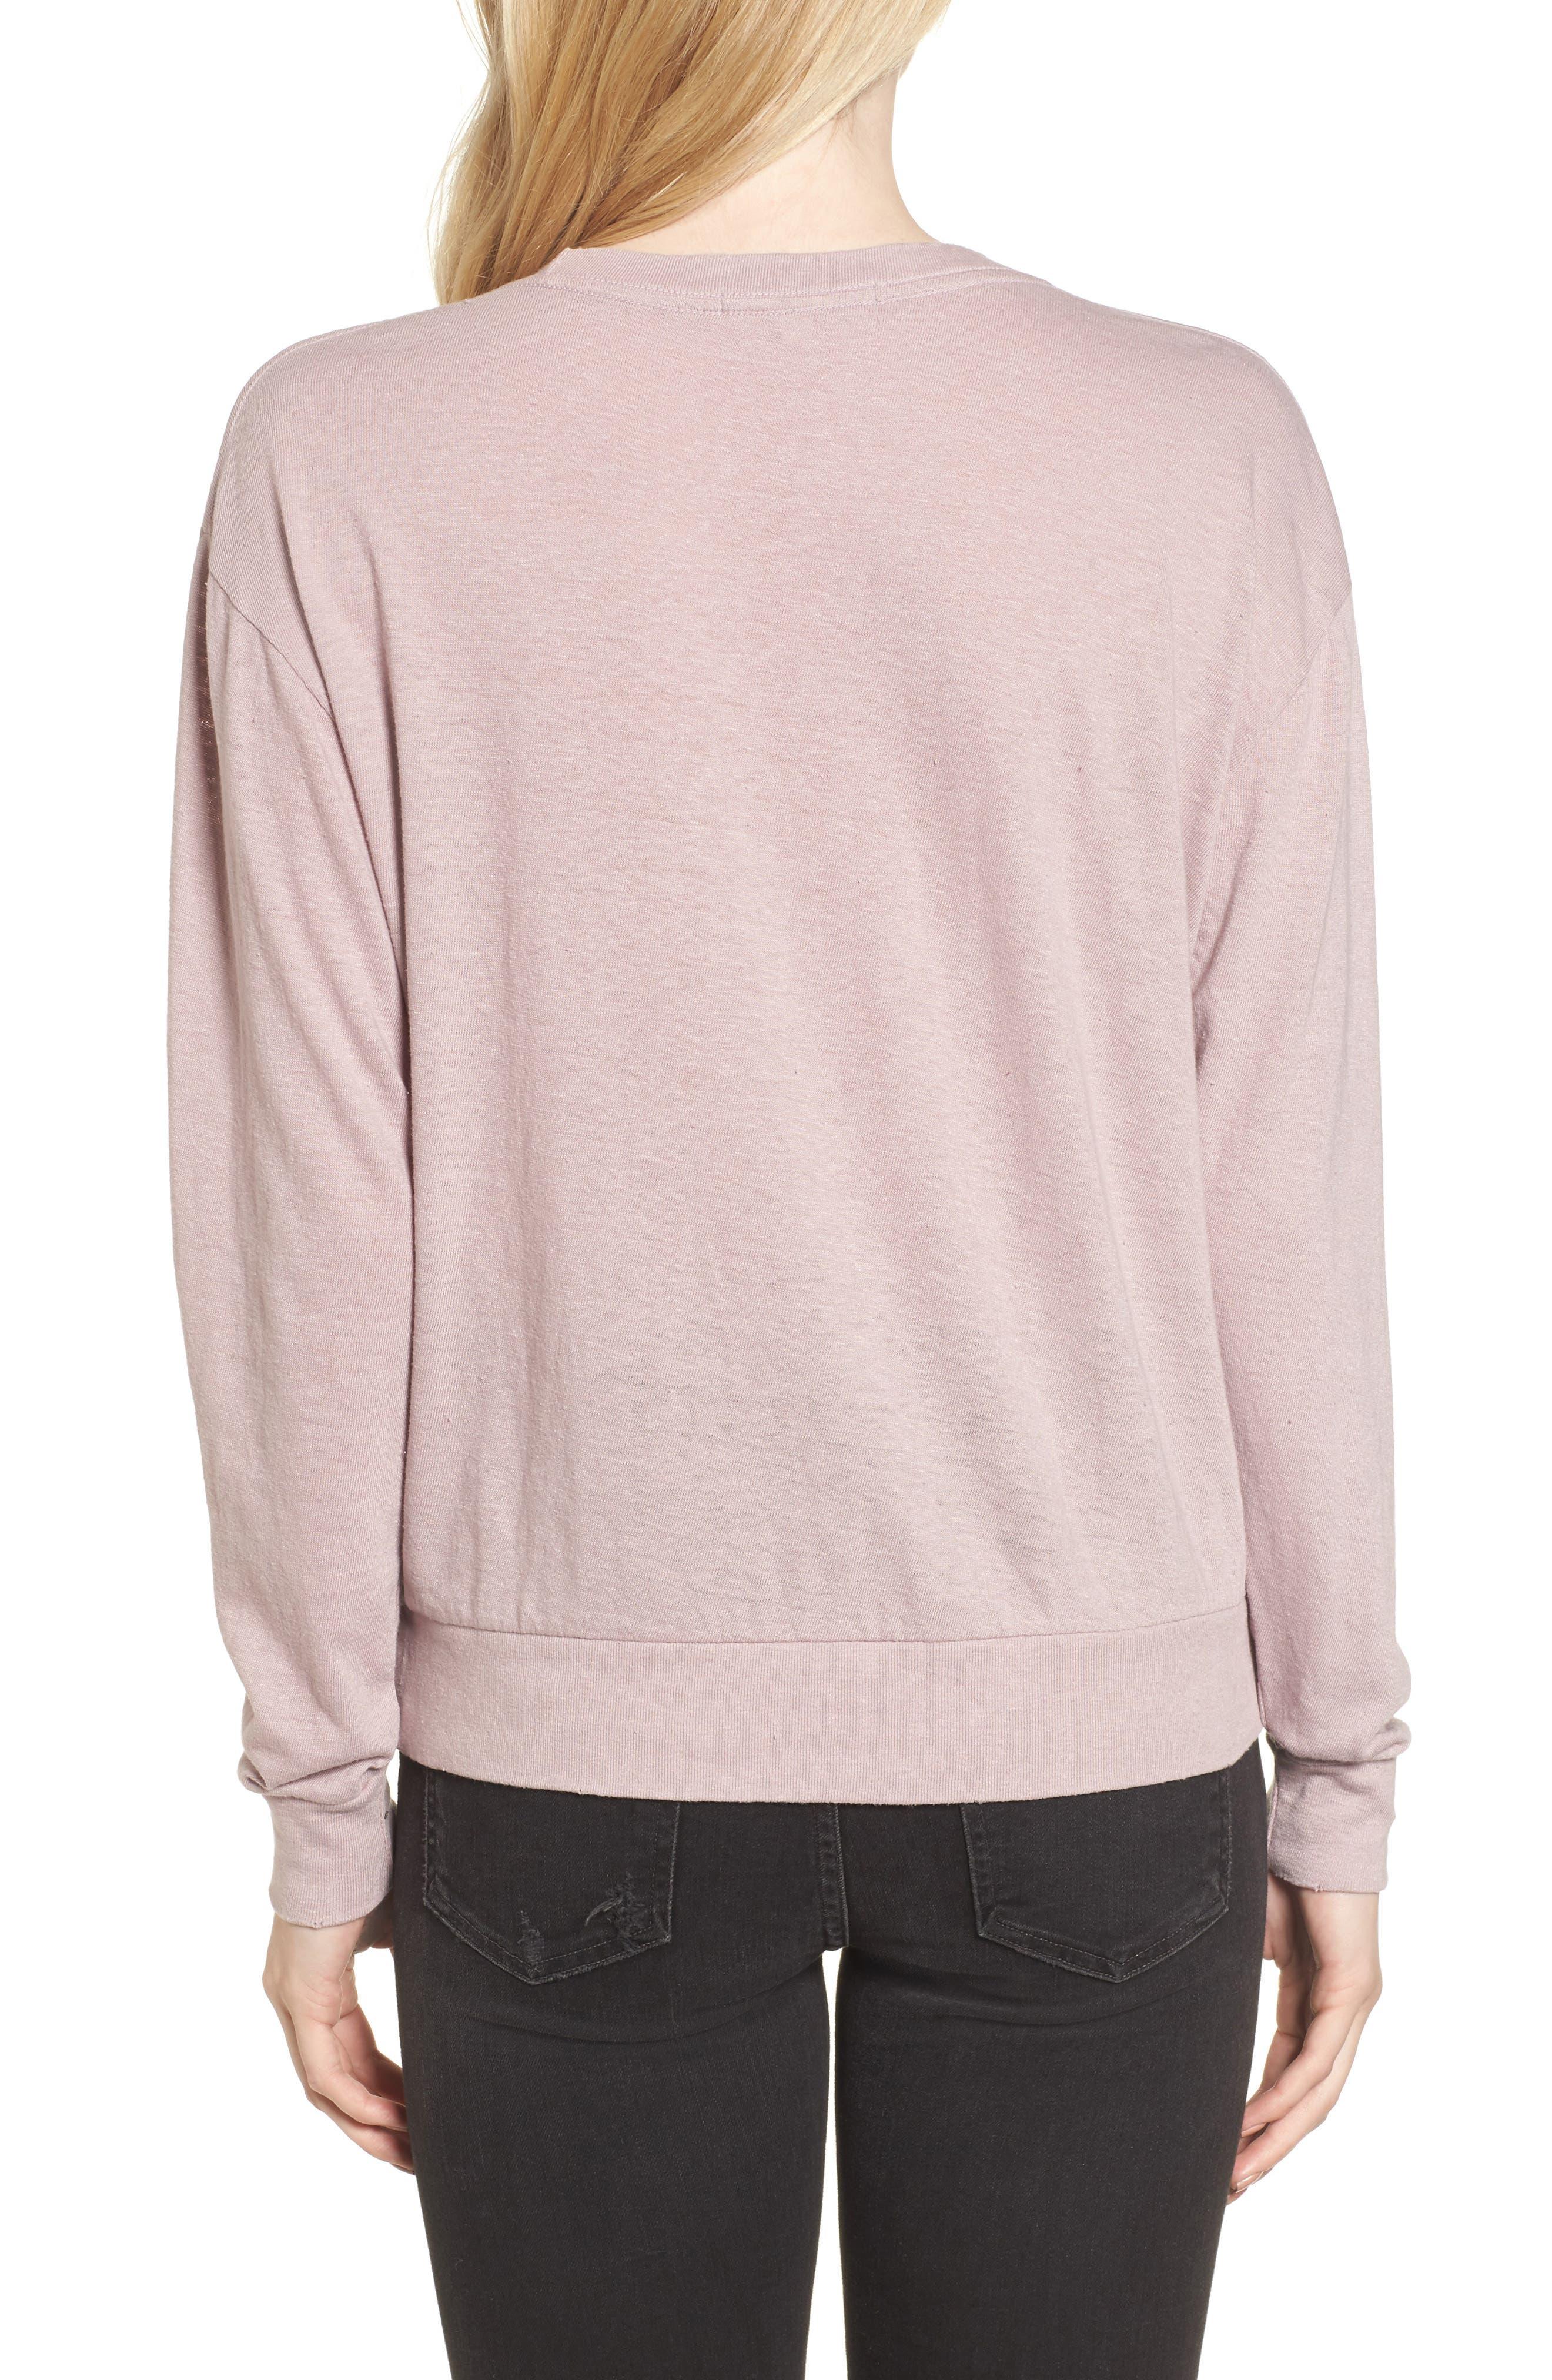 Champagne Diet Sweatshirt,                             Alternate thumbnail 2, color,                             650